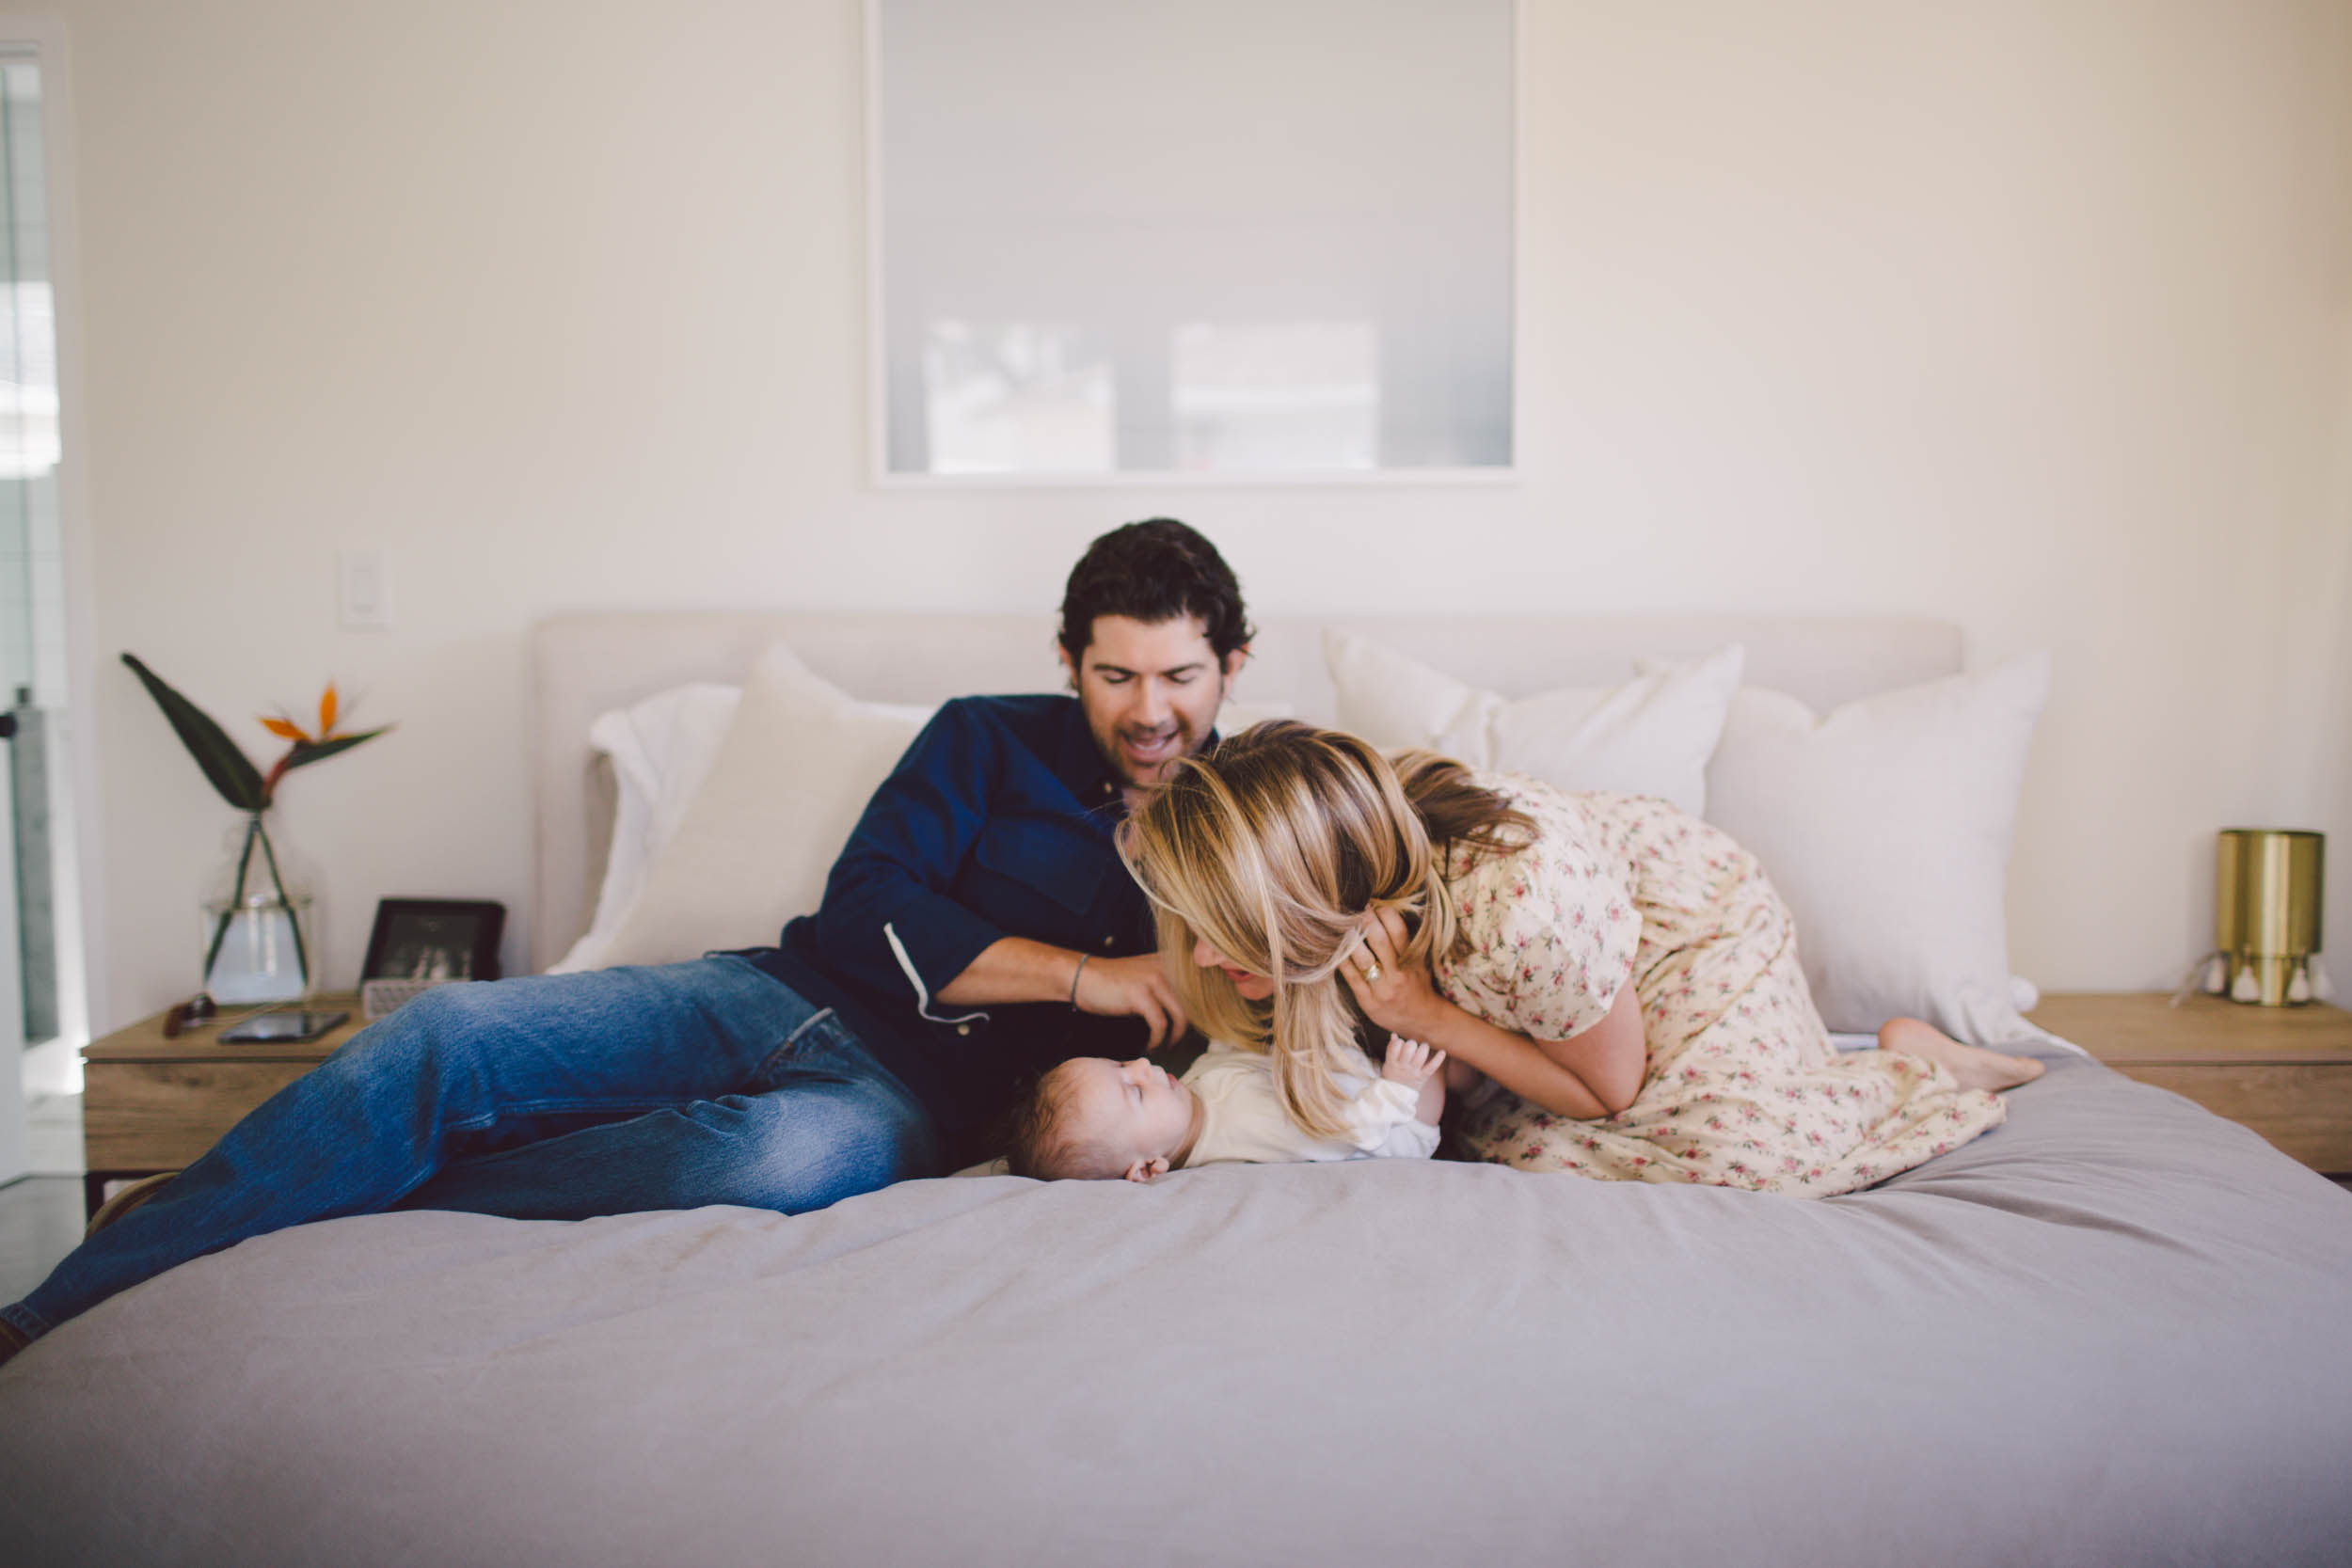 venice-california- family-lifestyle-photographer-boho-nursery-los angeles